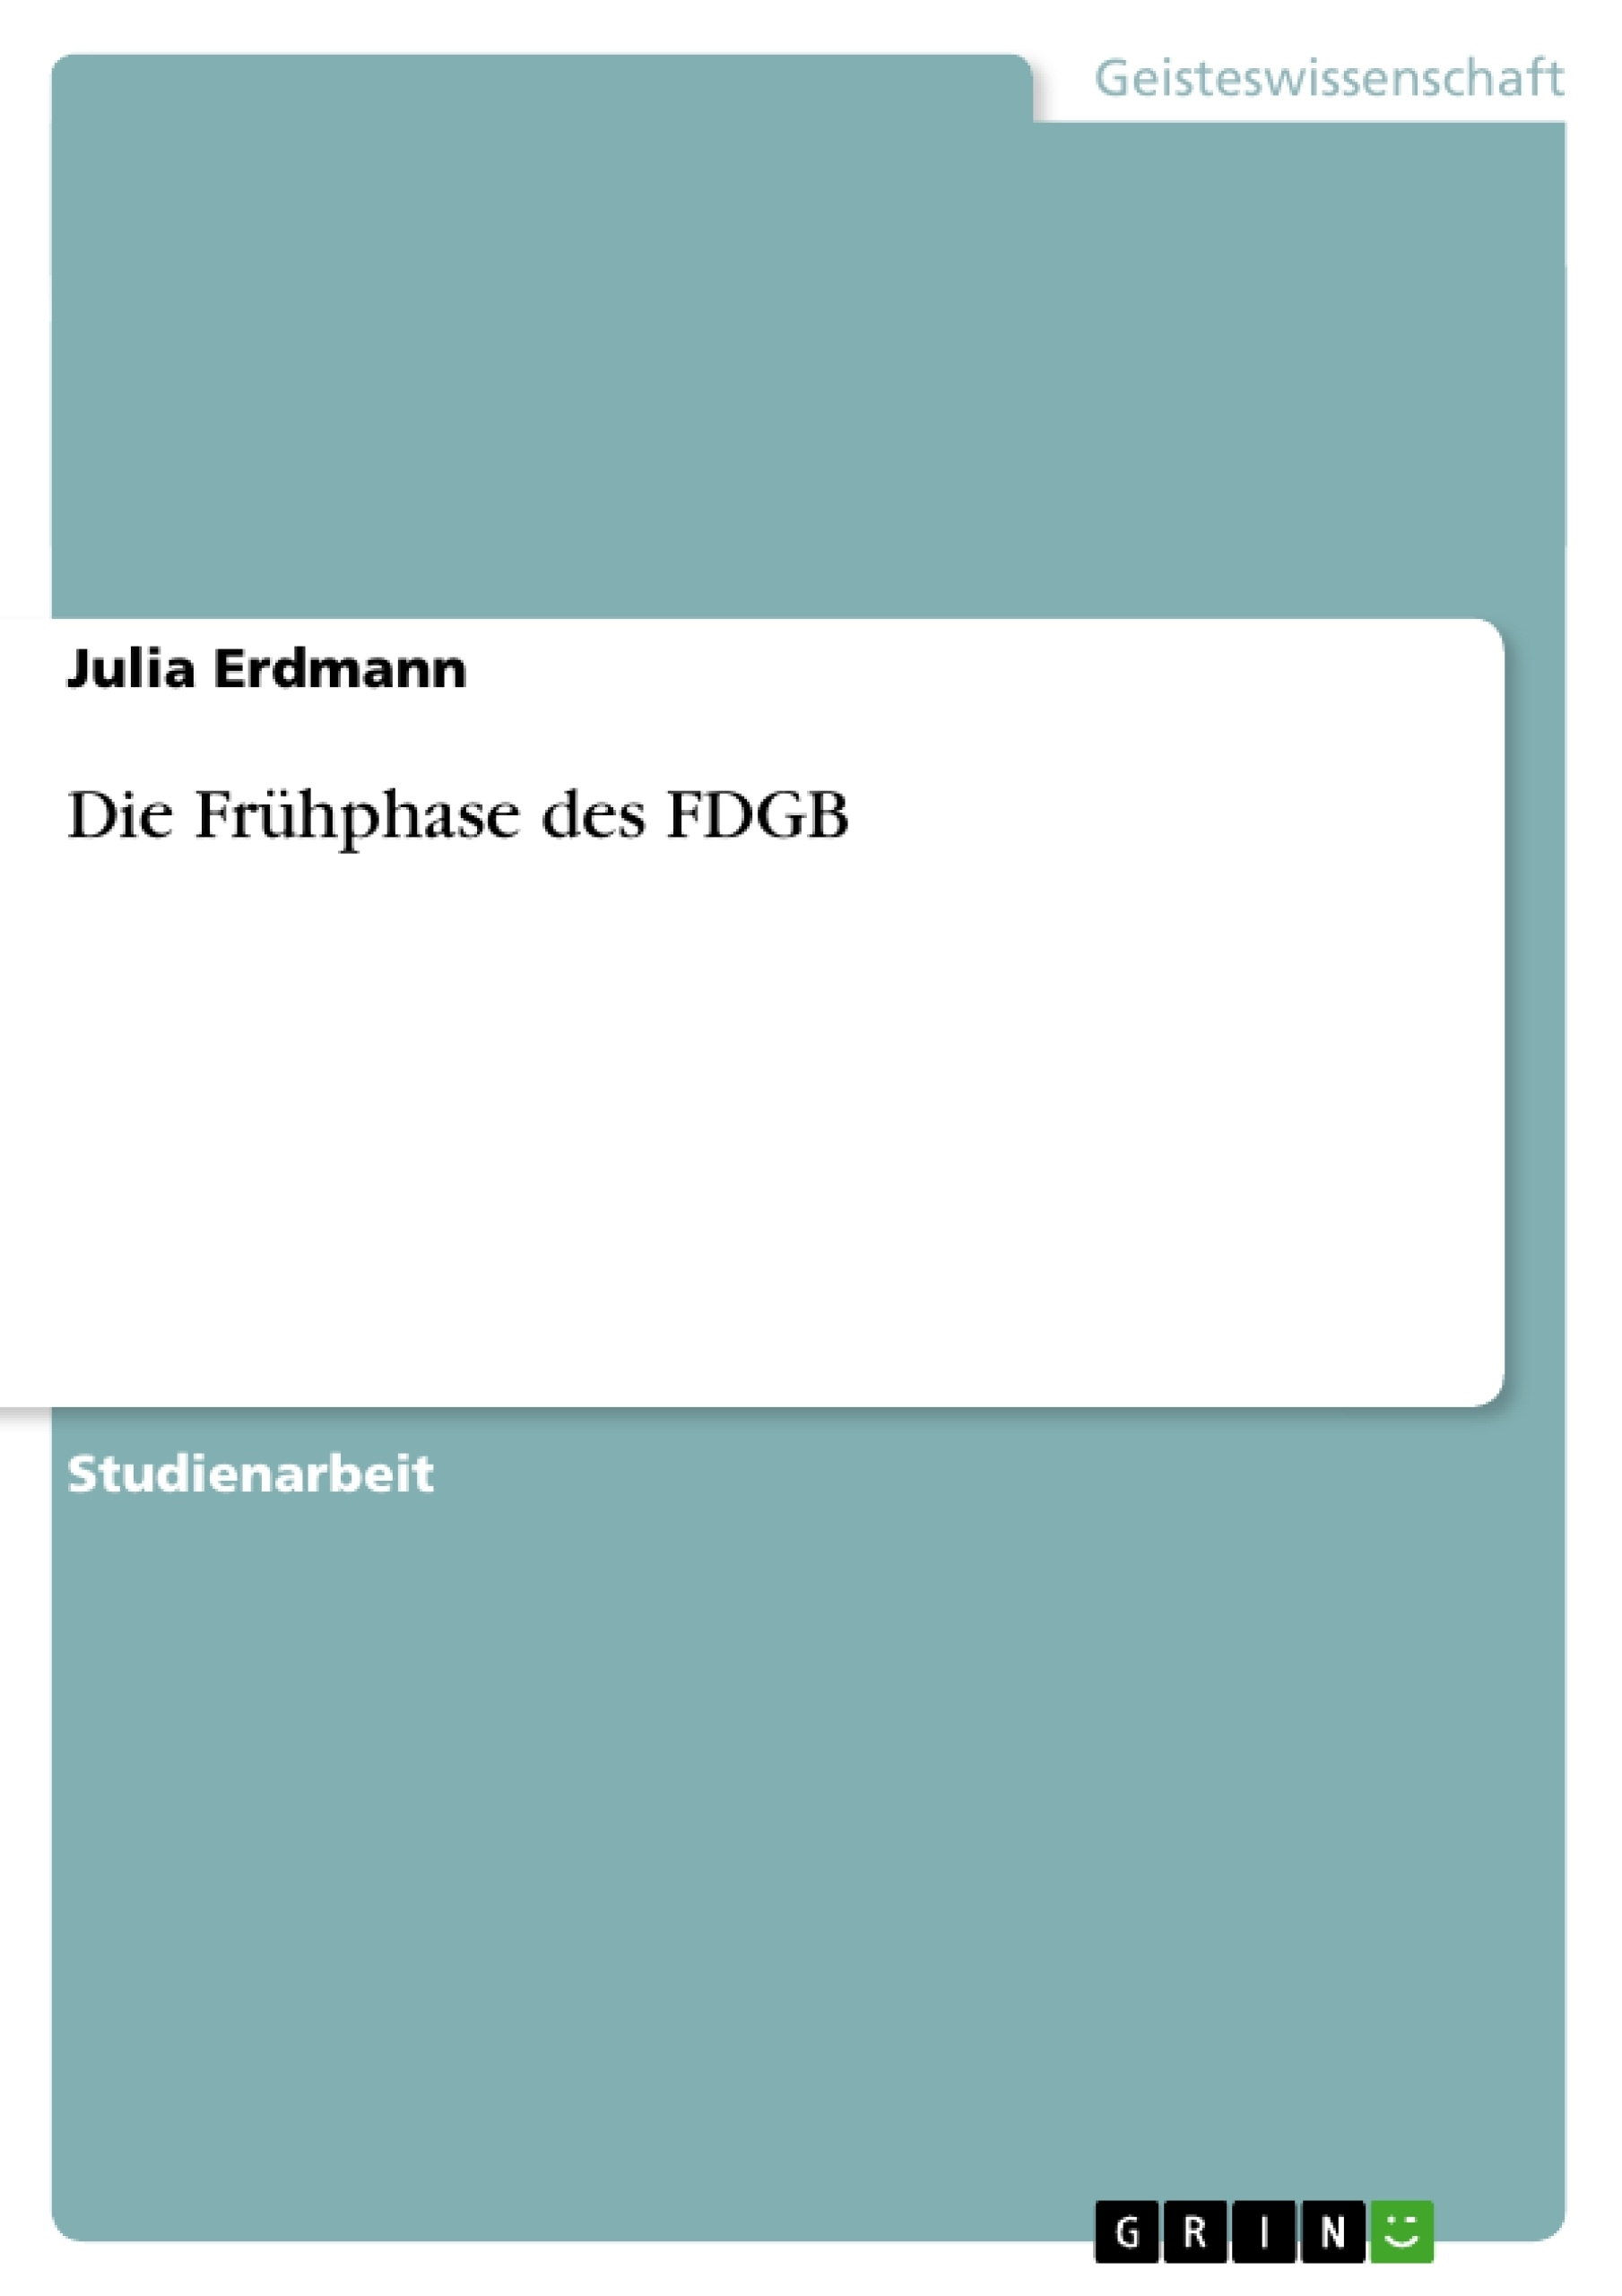 Titel: Die Frühphase des FDGB